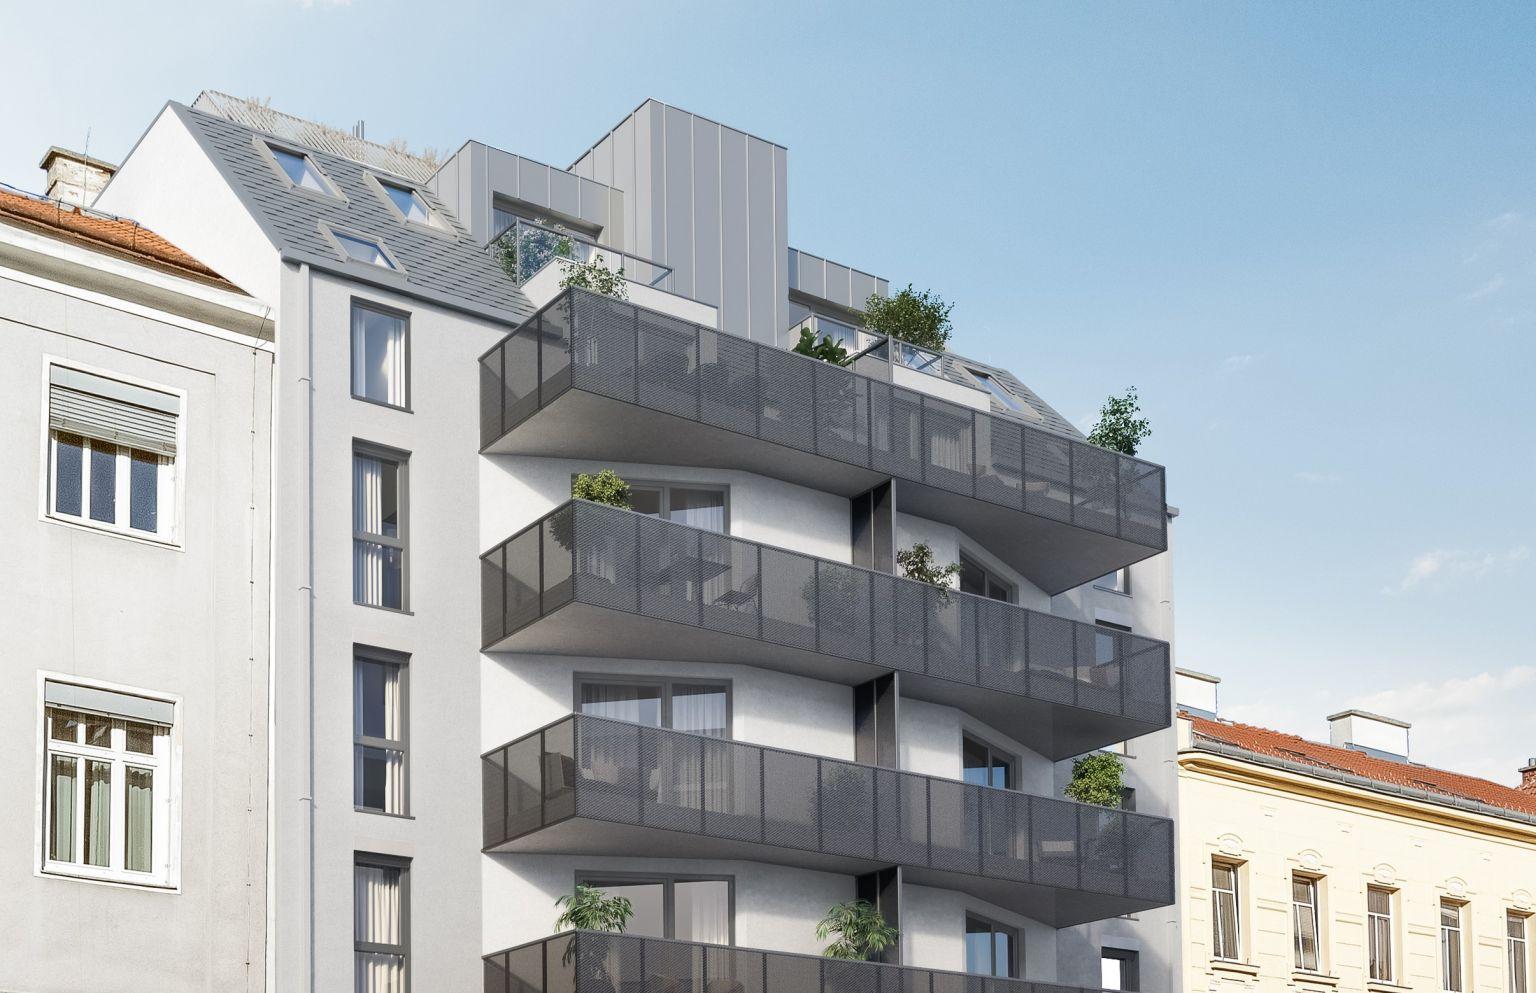 WINEGG-Wohnprojekt feiert Dachgleiche